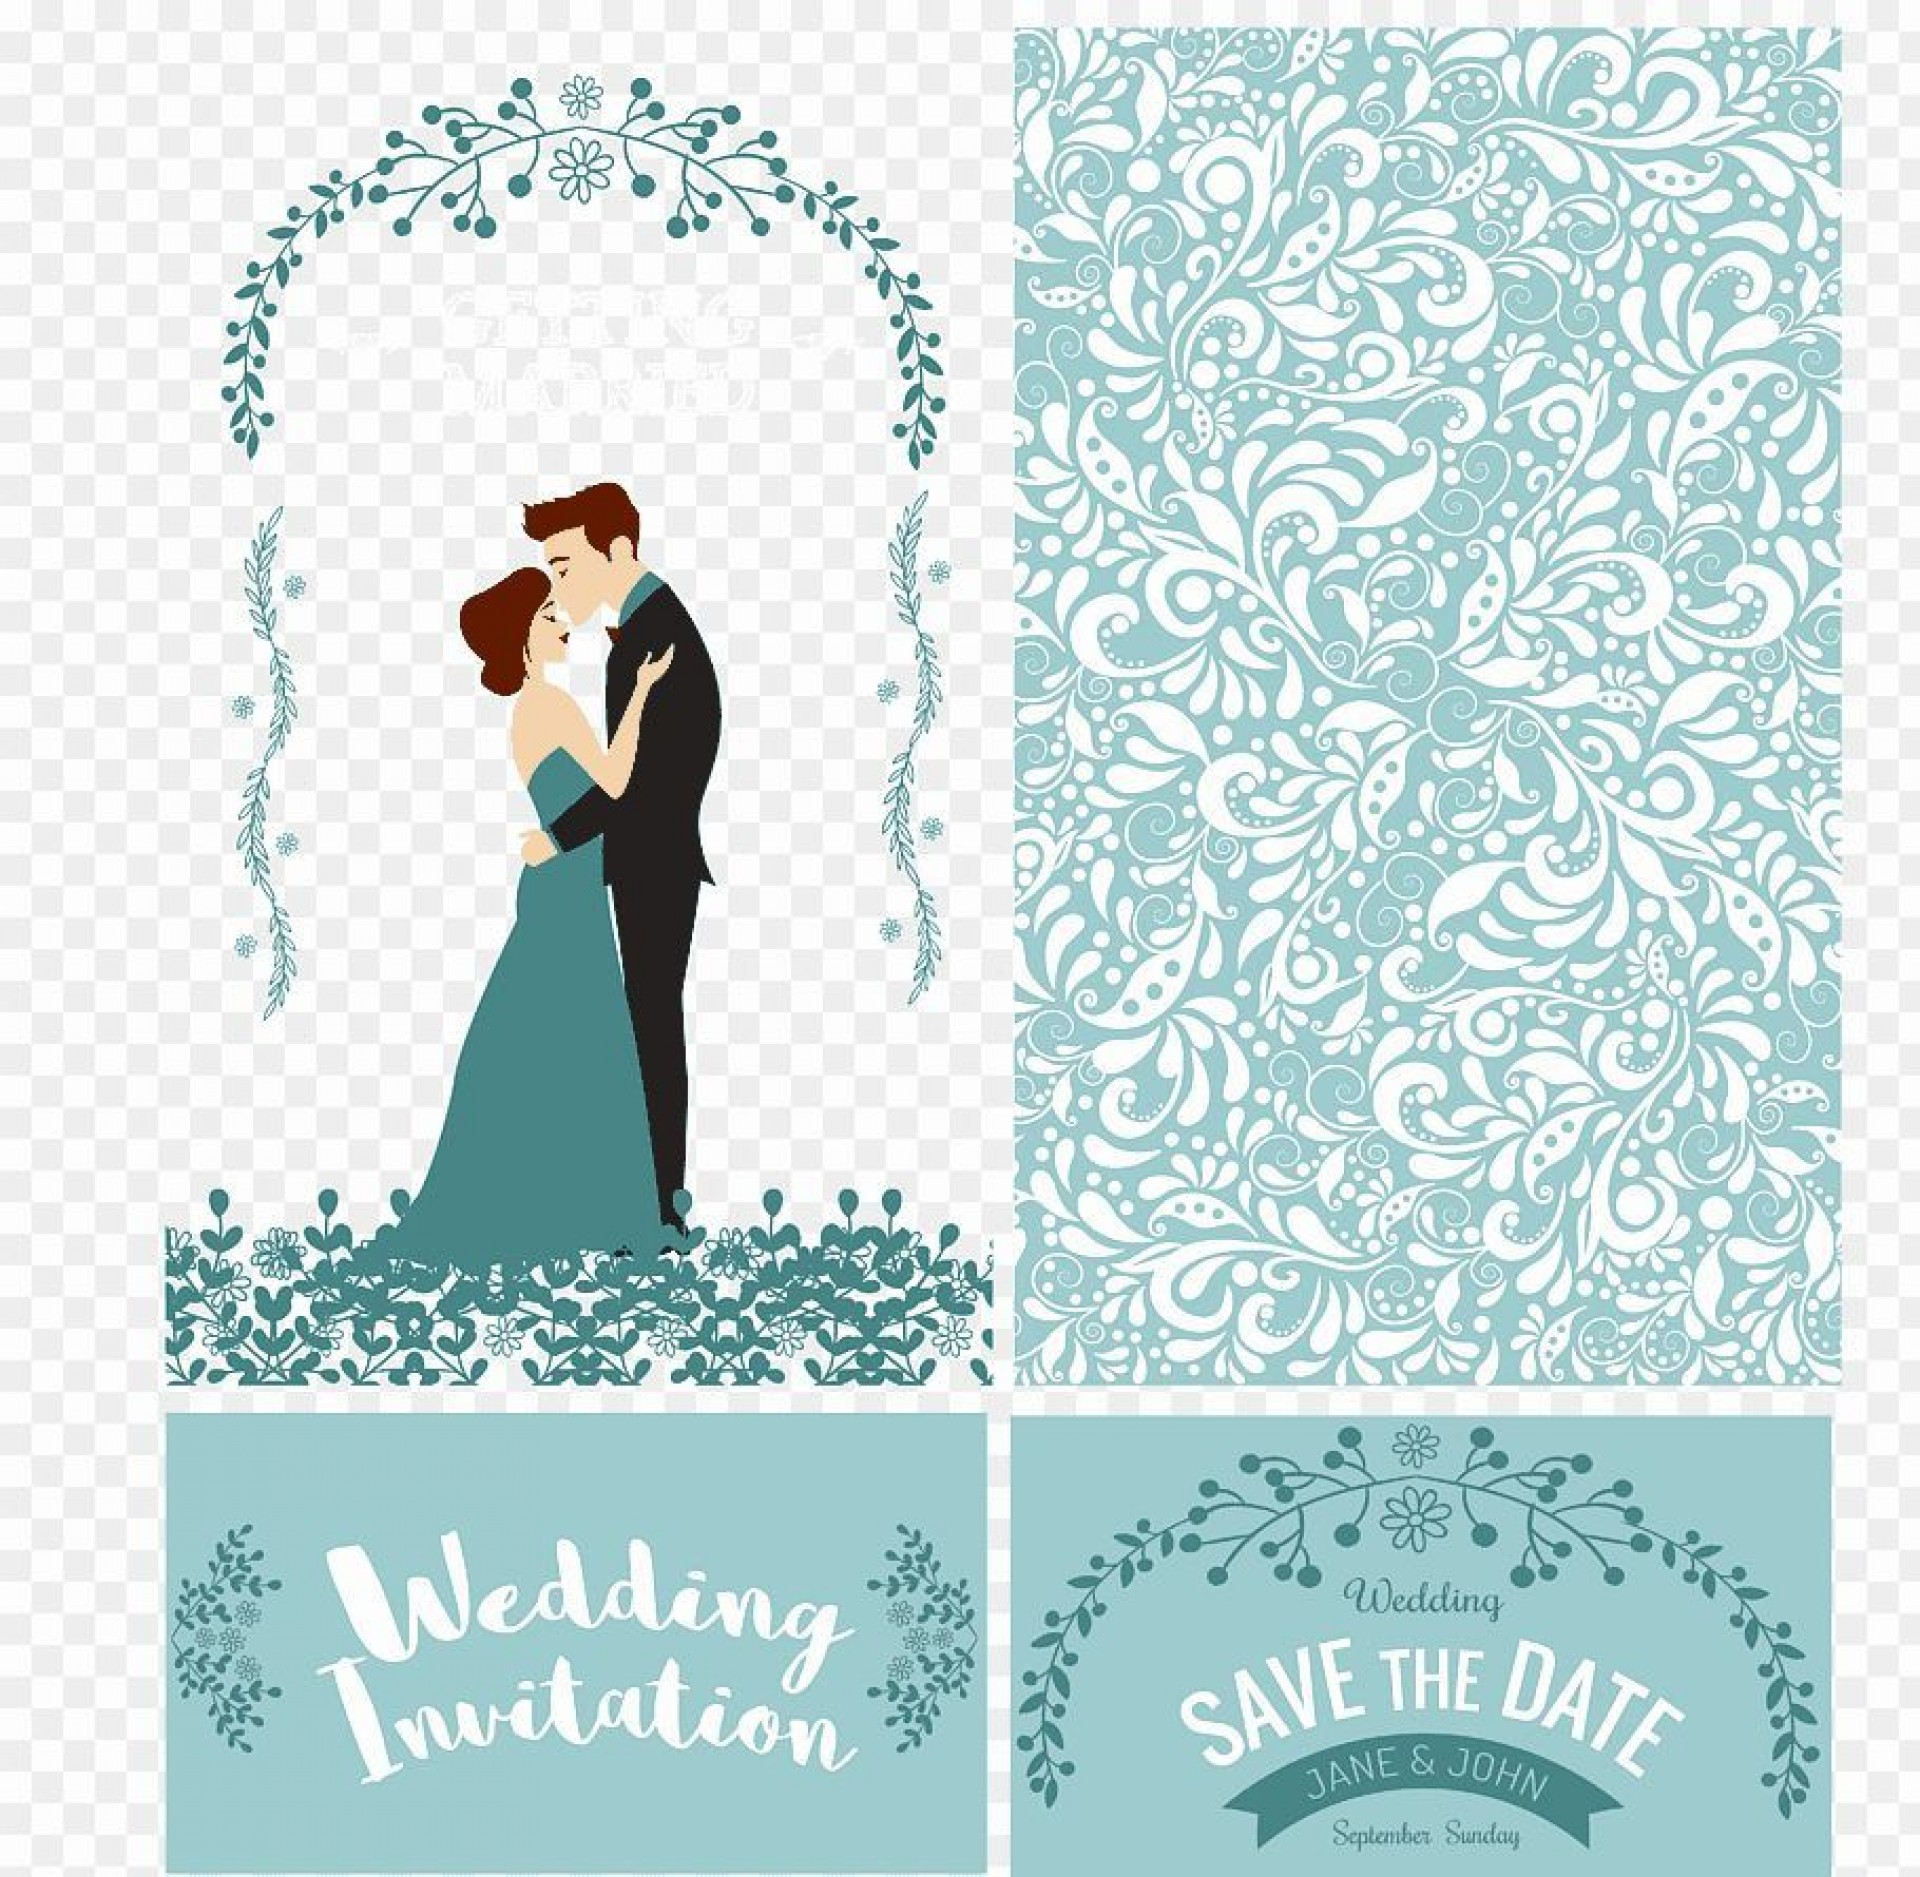 000 Marvelou Microsoft Office Wedding Invitation Template Photo  Templates M1920